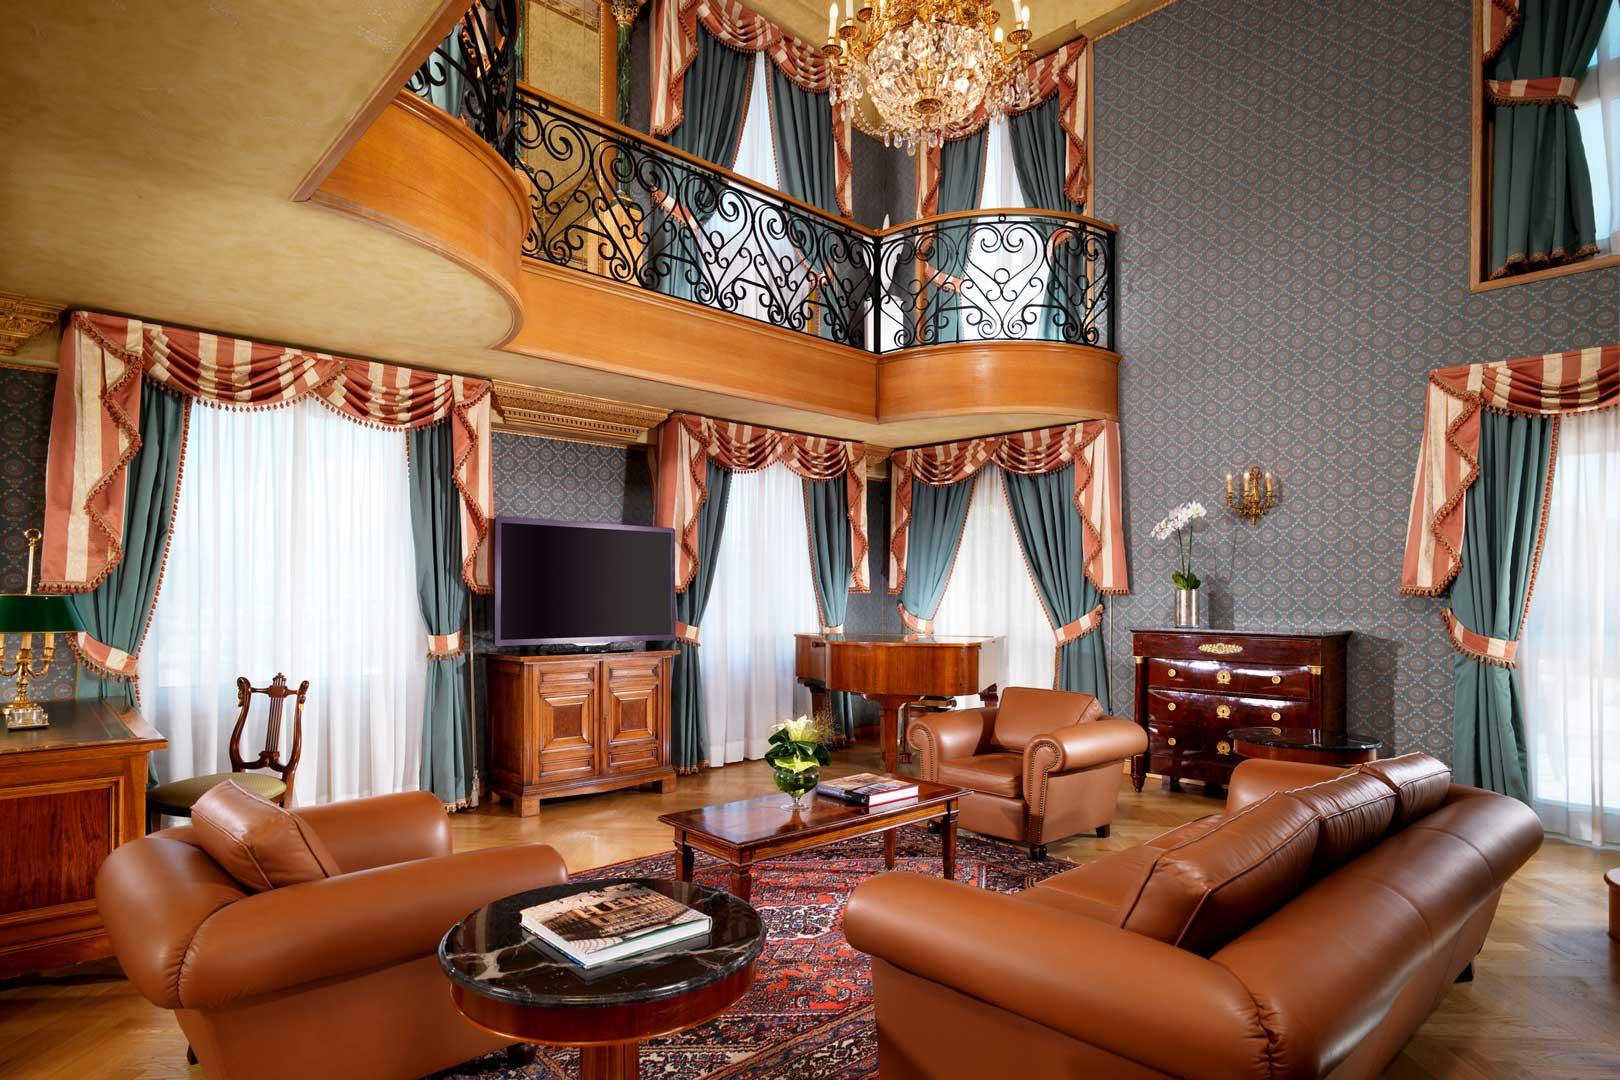 Westin Palace Milan - Presidential Suite